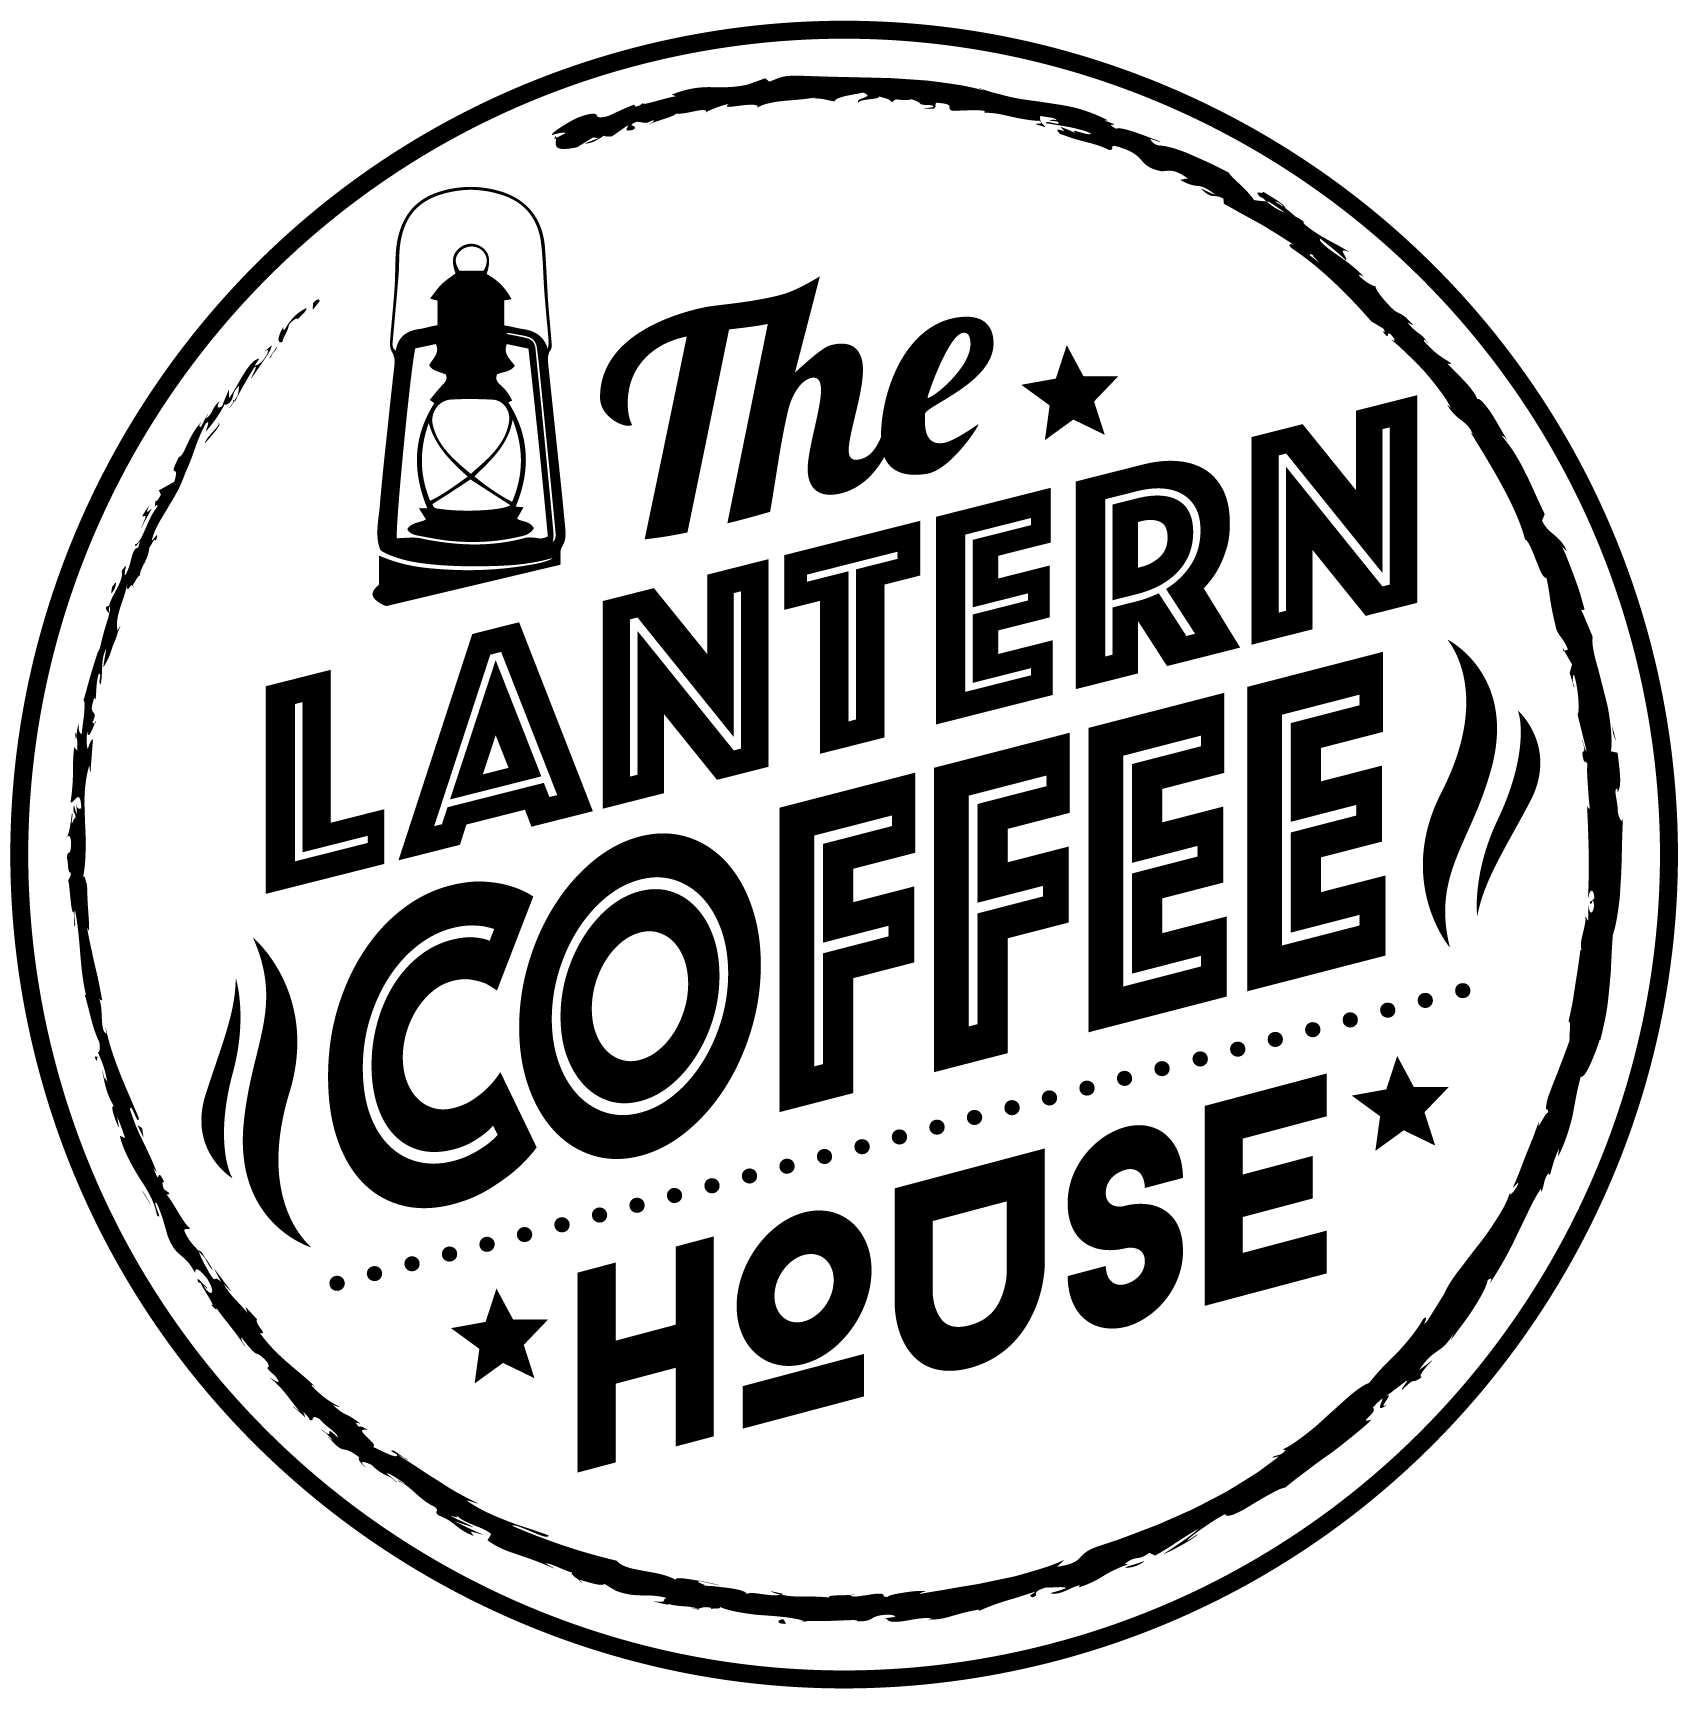 Lantern Coffee House